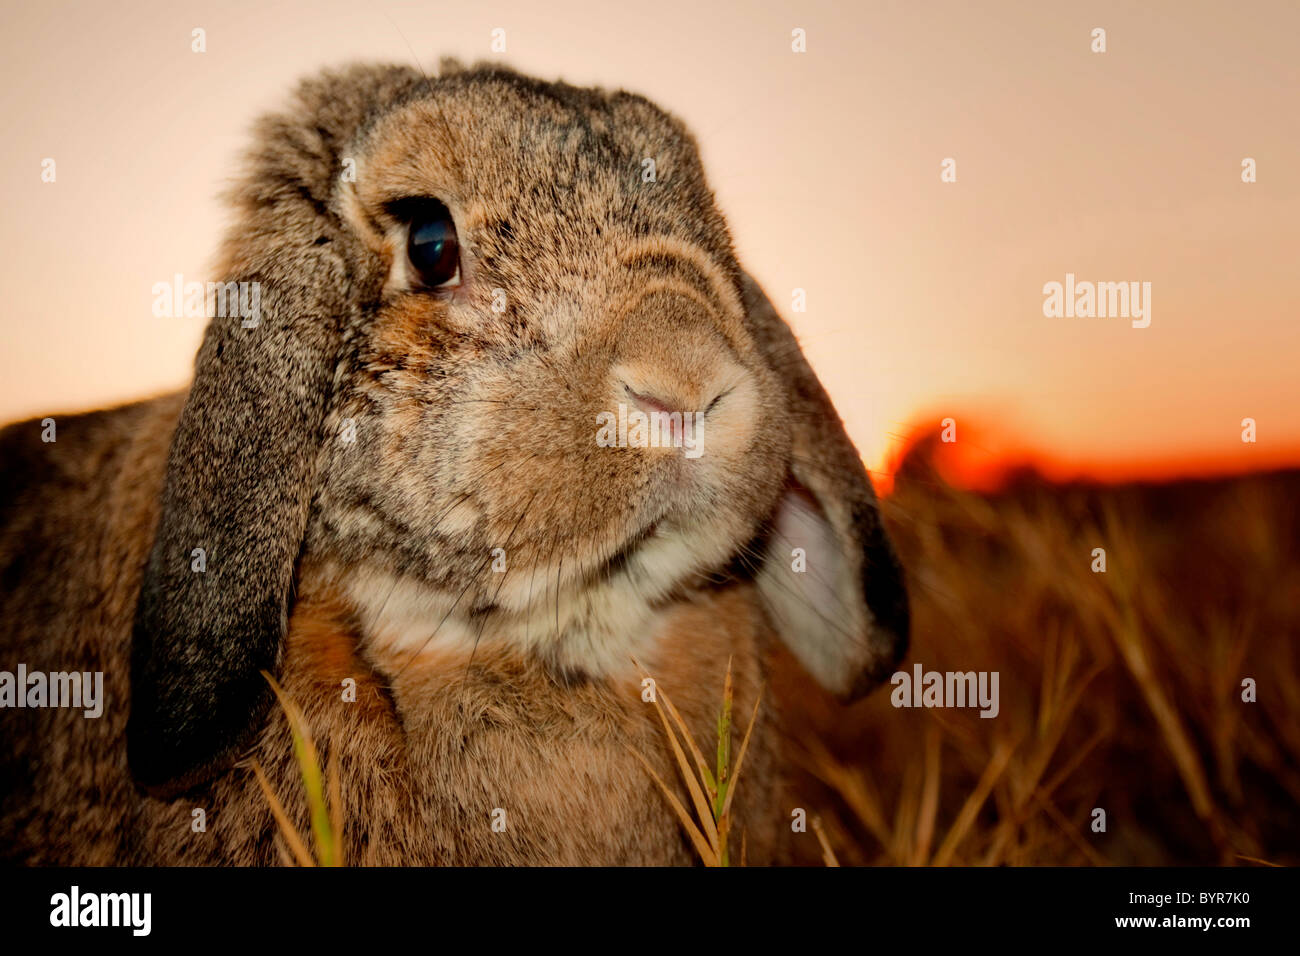 Close-up de conejo al atardecer Imagen De Stock